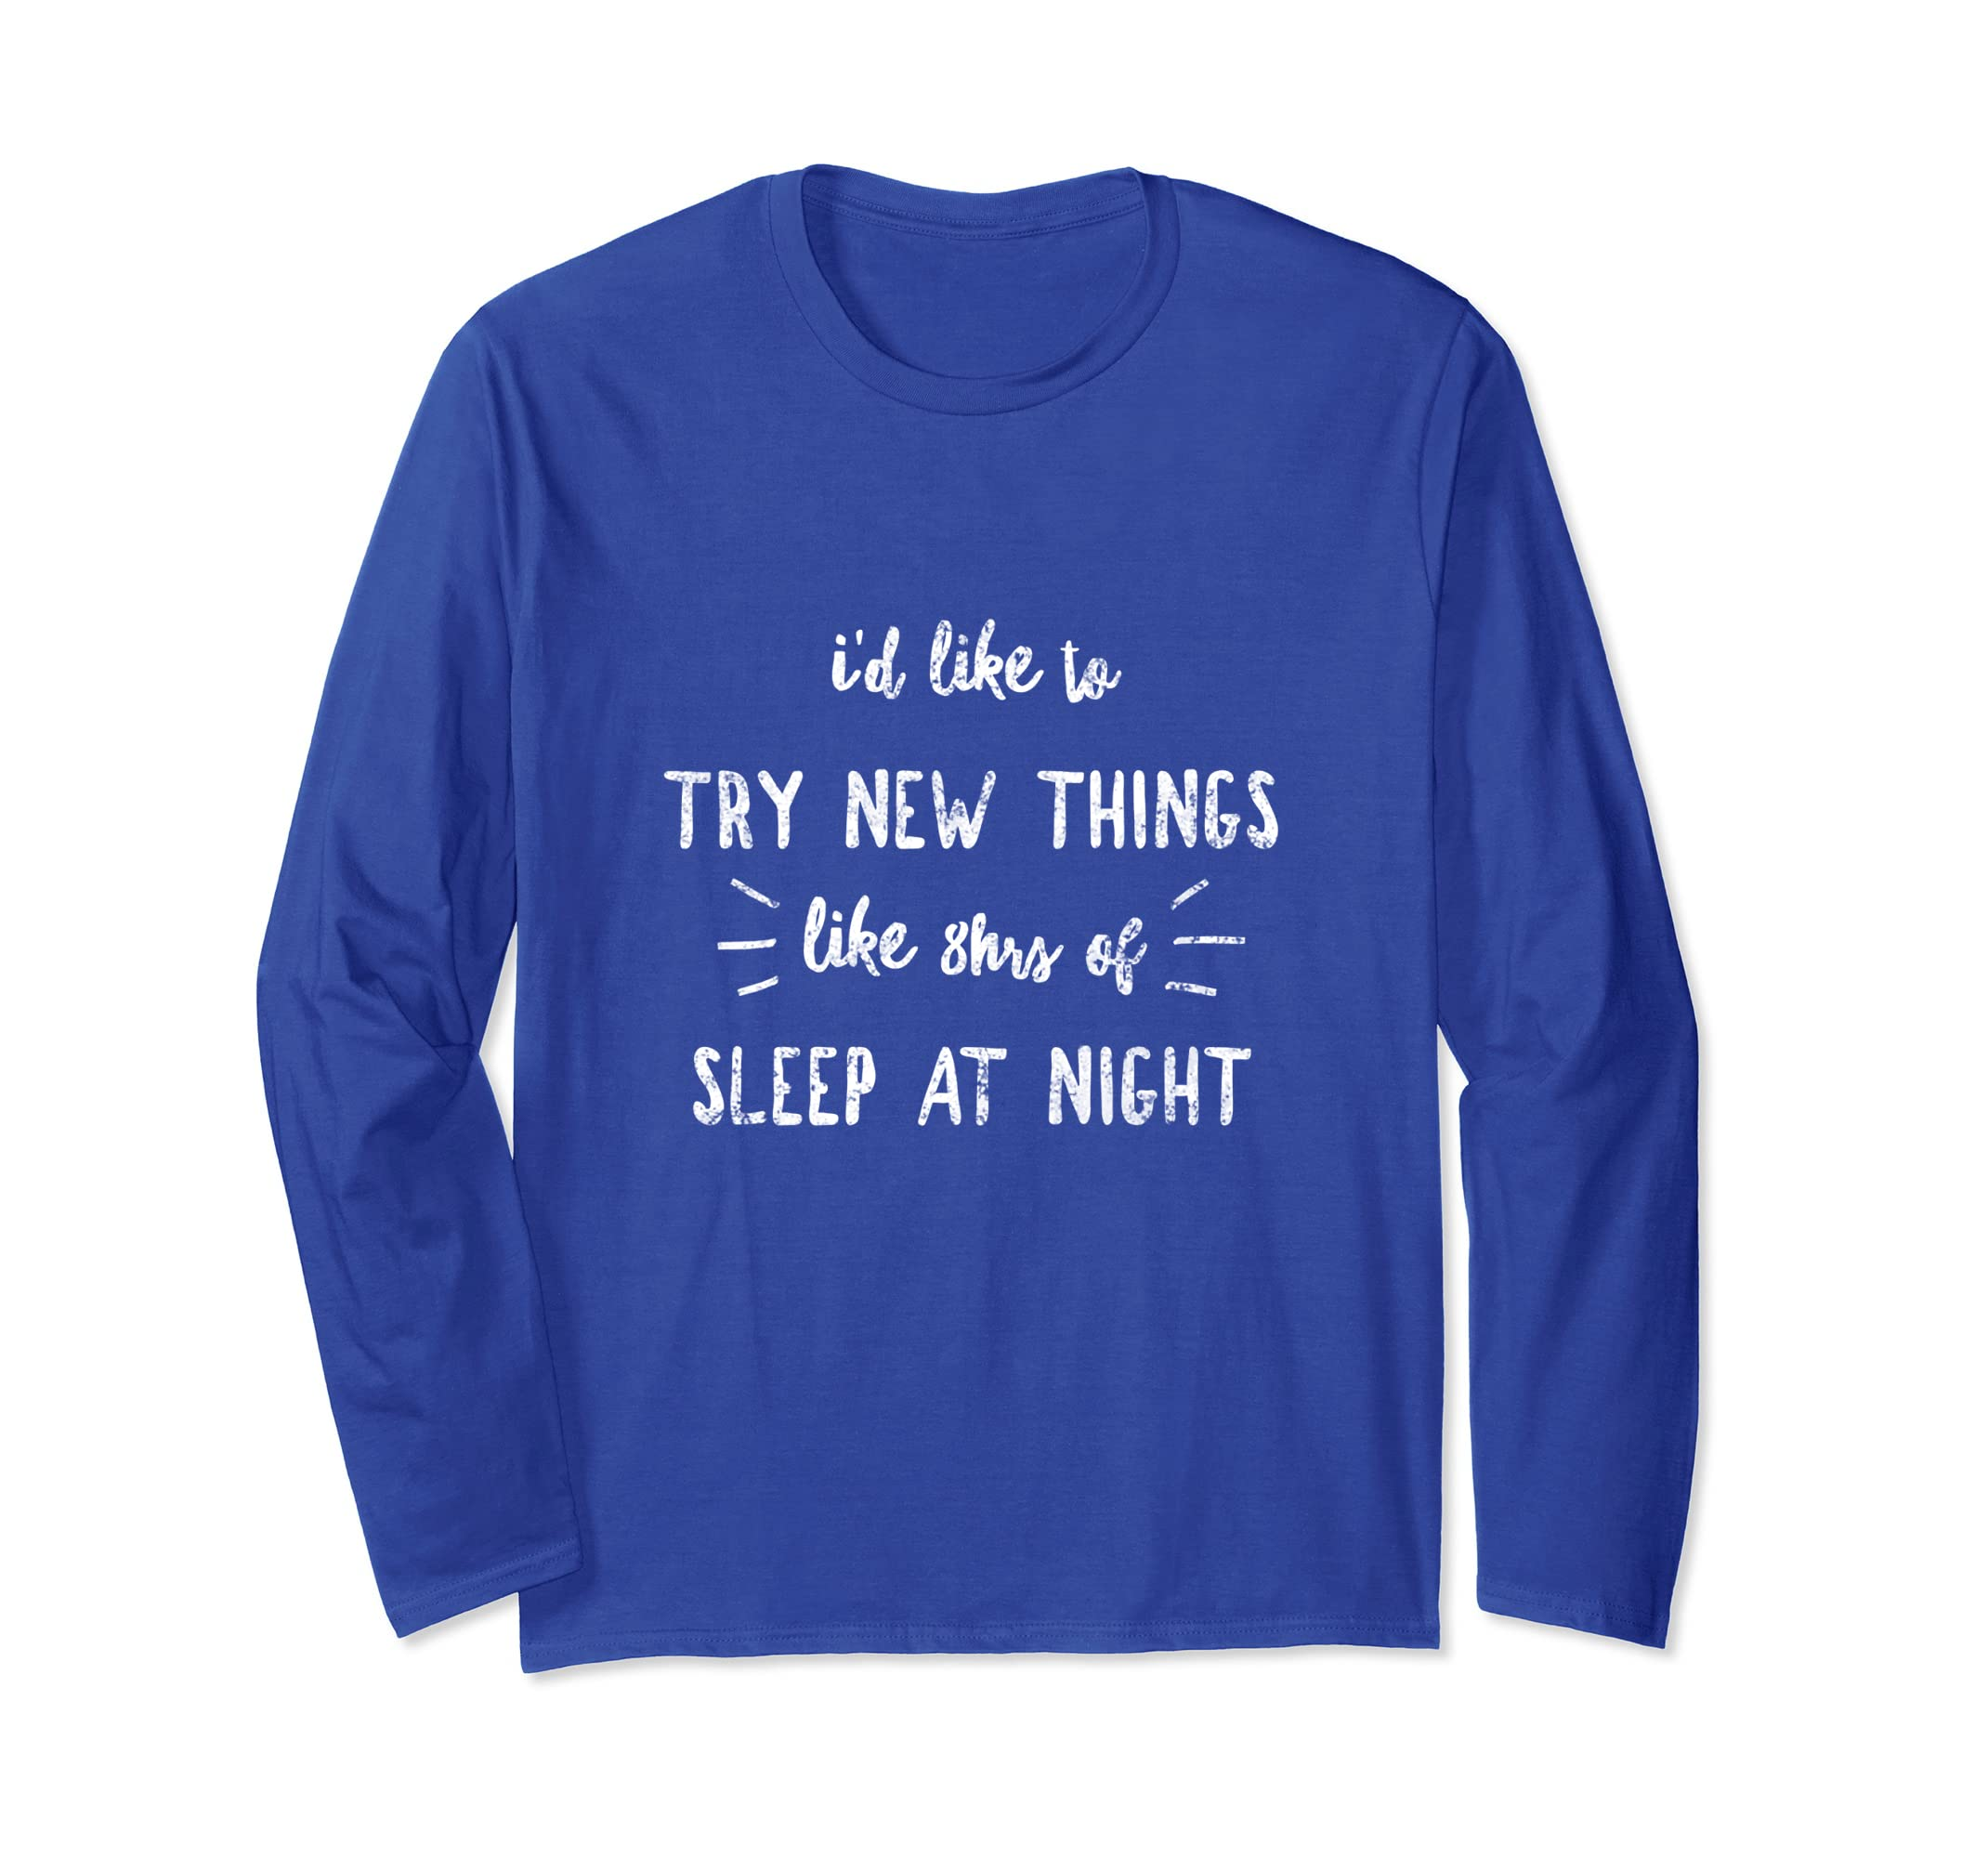   Try New Things Like 8hrs of Sleep Tired Mom Tshirt-ln